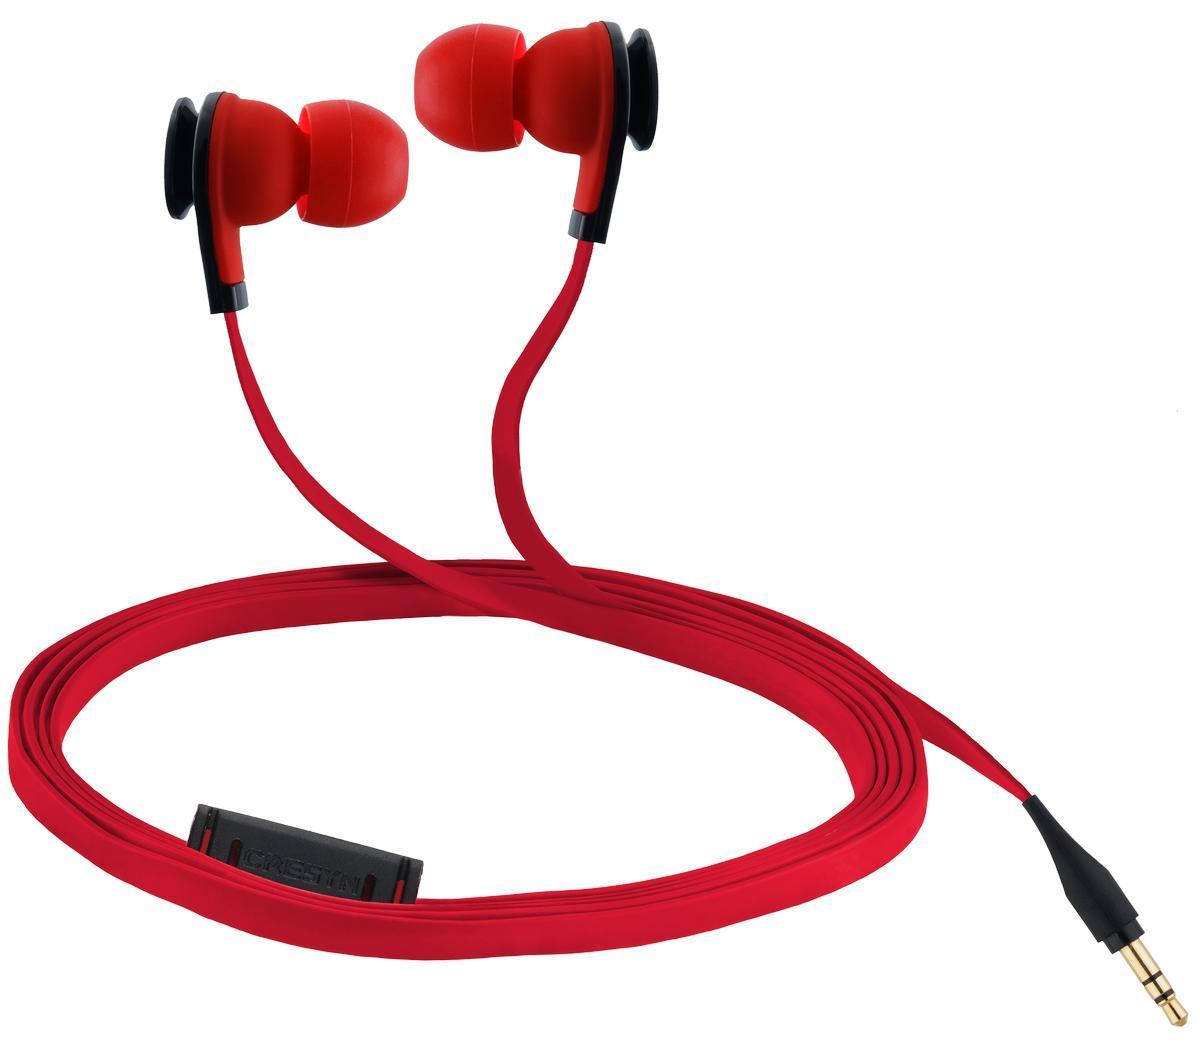 цена на Cresyn C520S, Red наушники с микрофоном